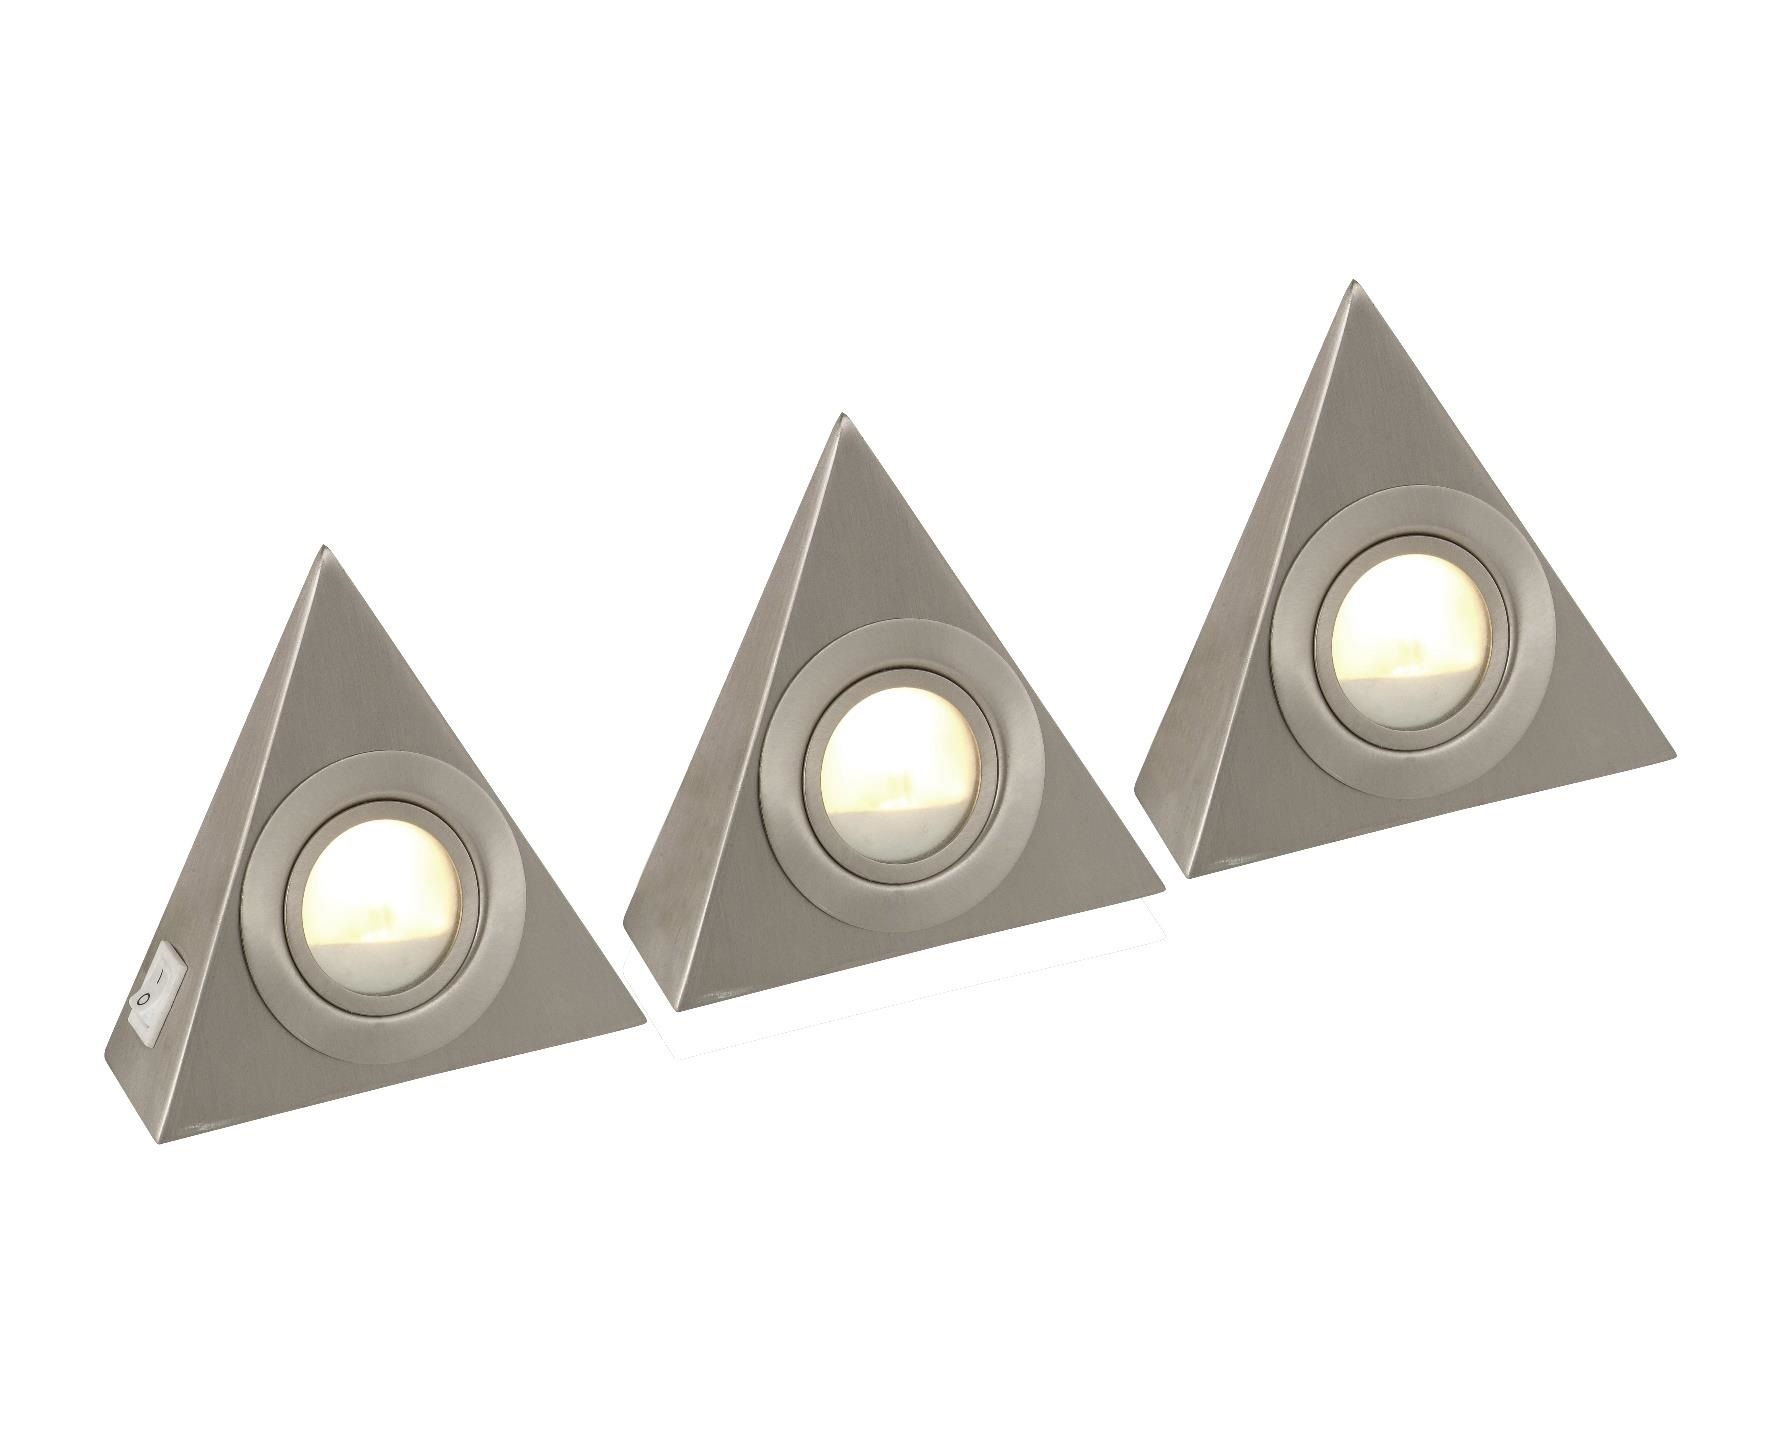 Светильник точечный Globo 1205-3LEDТочечный свет<br>&amp;lt;div&amp;gt;&amp;lt;div&amp;gt;Вид цоколя: LED&amp;lt;/div&amp;gt;&amp;lt;div&amp;gt;Мощность: &amp;amp;nbsp;5W&amp;amp;nbsp;&amp;lt;/div&amp;gt;&amp;lt;div&amp;gt;Количество ламп: 3 (в комплекте)&amp;lt;/div&amp;gt;&amp;lt;/div&amp;gt;<br><br>Material: Металл<br>Ширина см: 14<br>Высота см: 4<br>Глубина см: 12